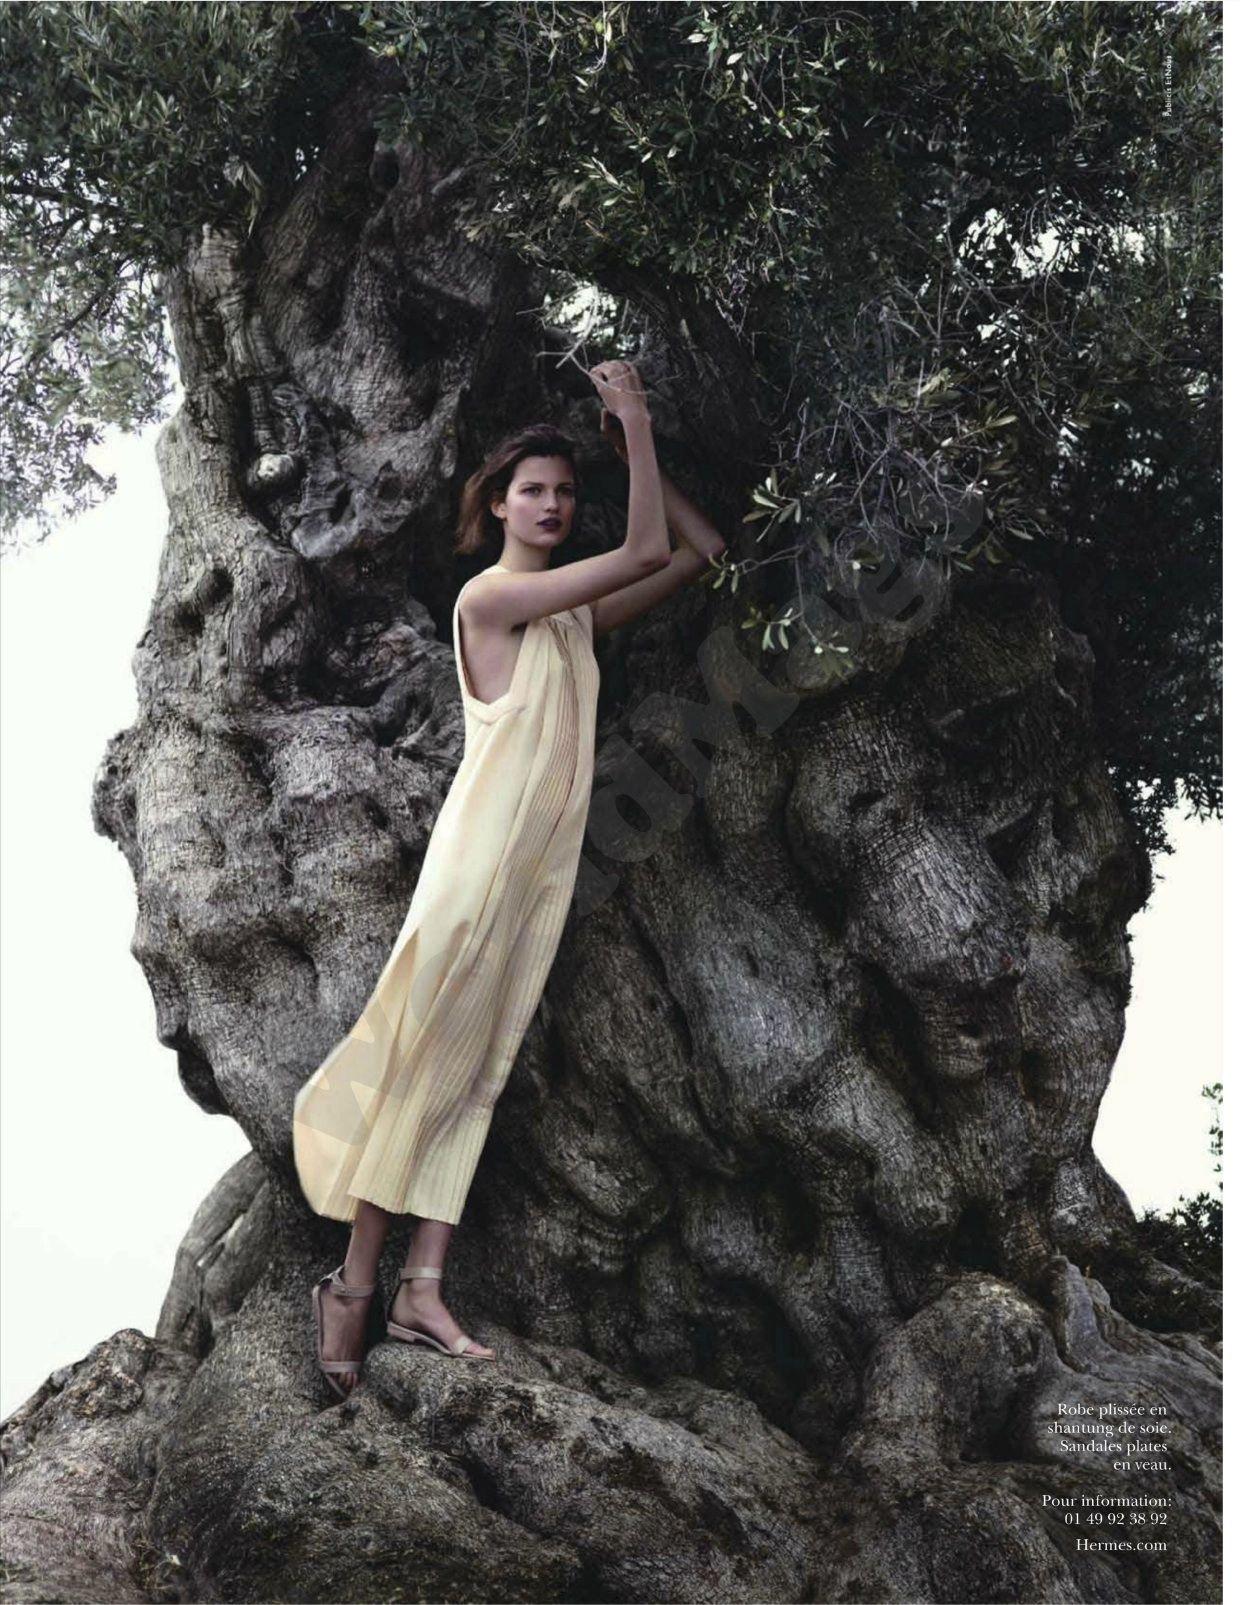 Art8amby S Blog: Hermès Spring Summer 2012 Ad Campaign